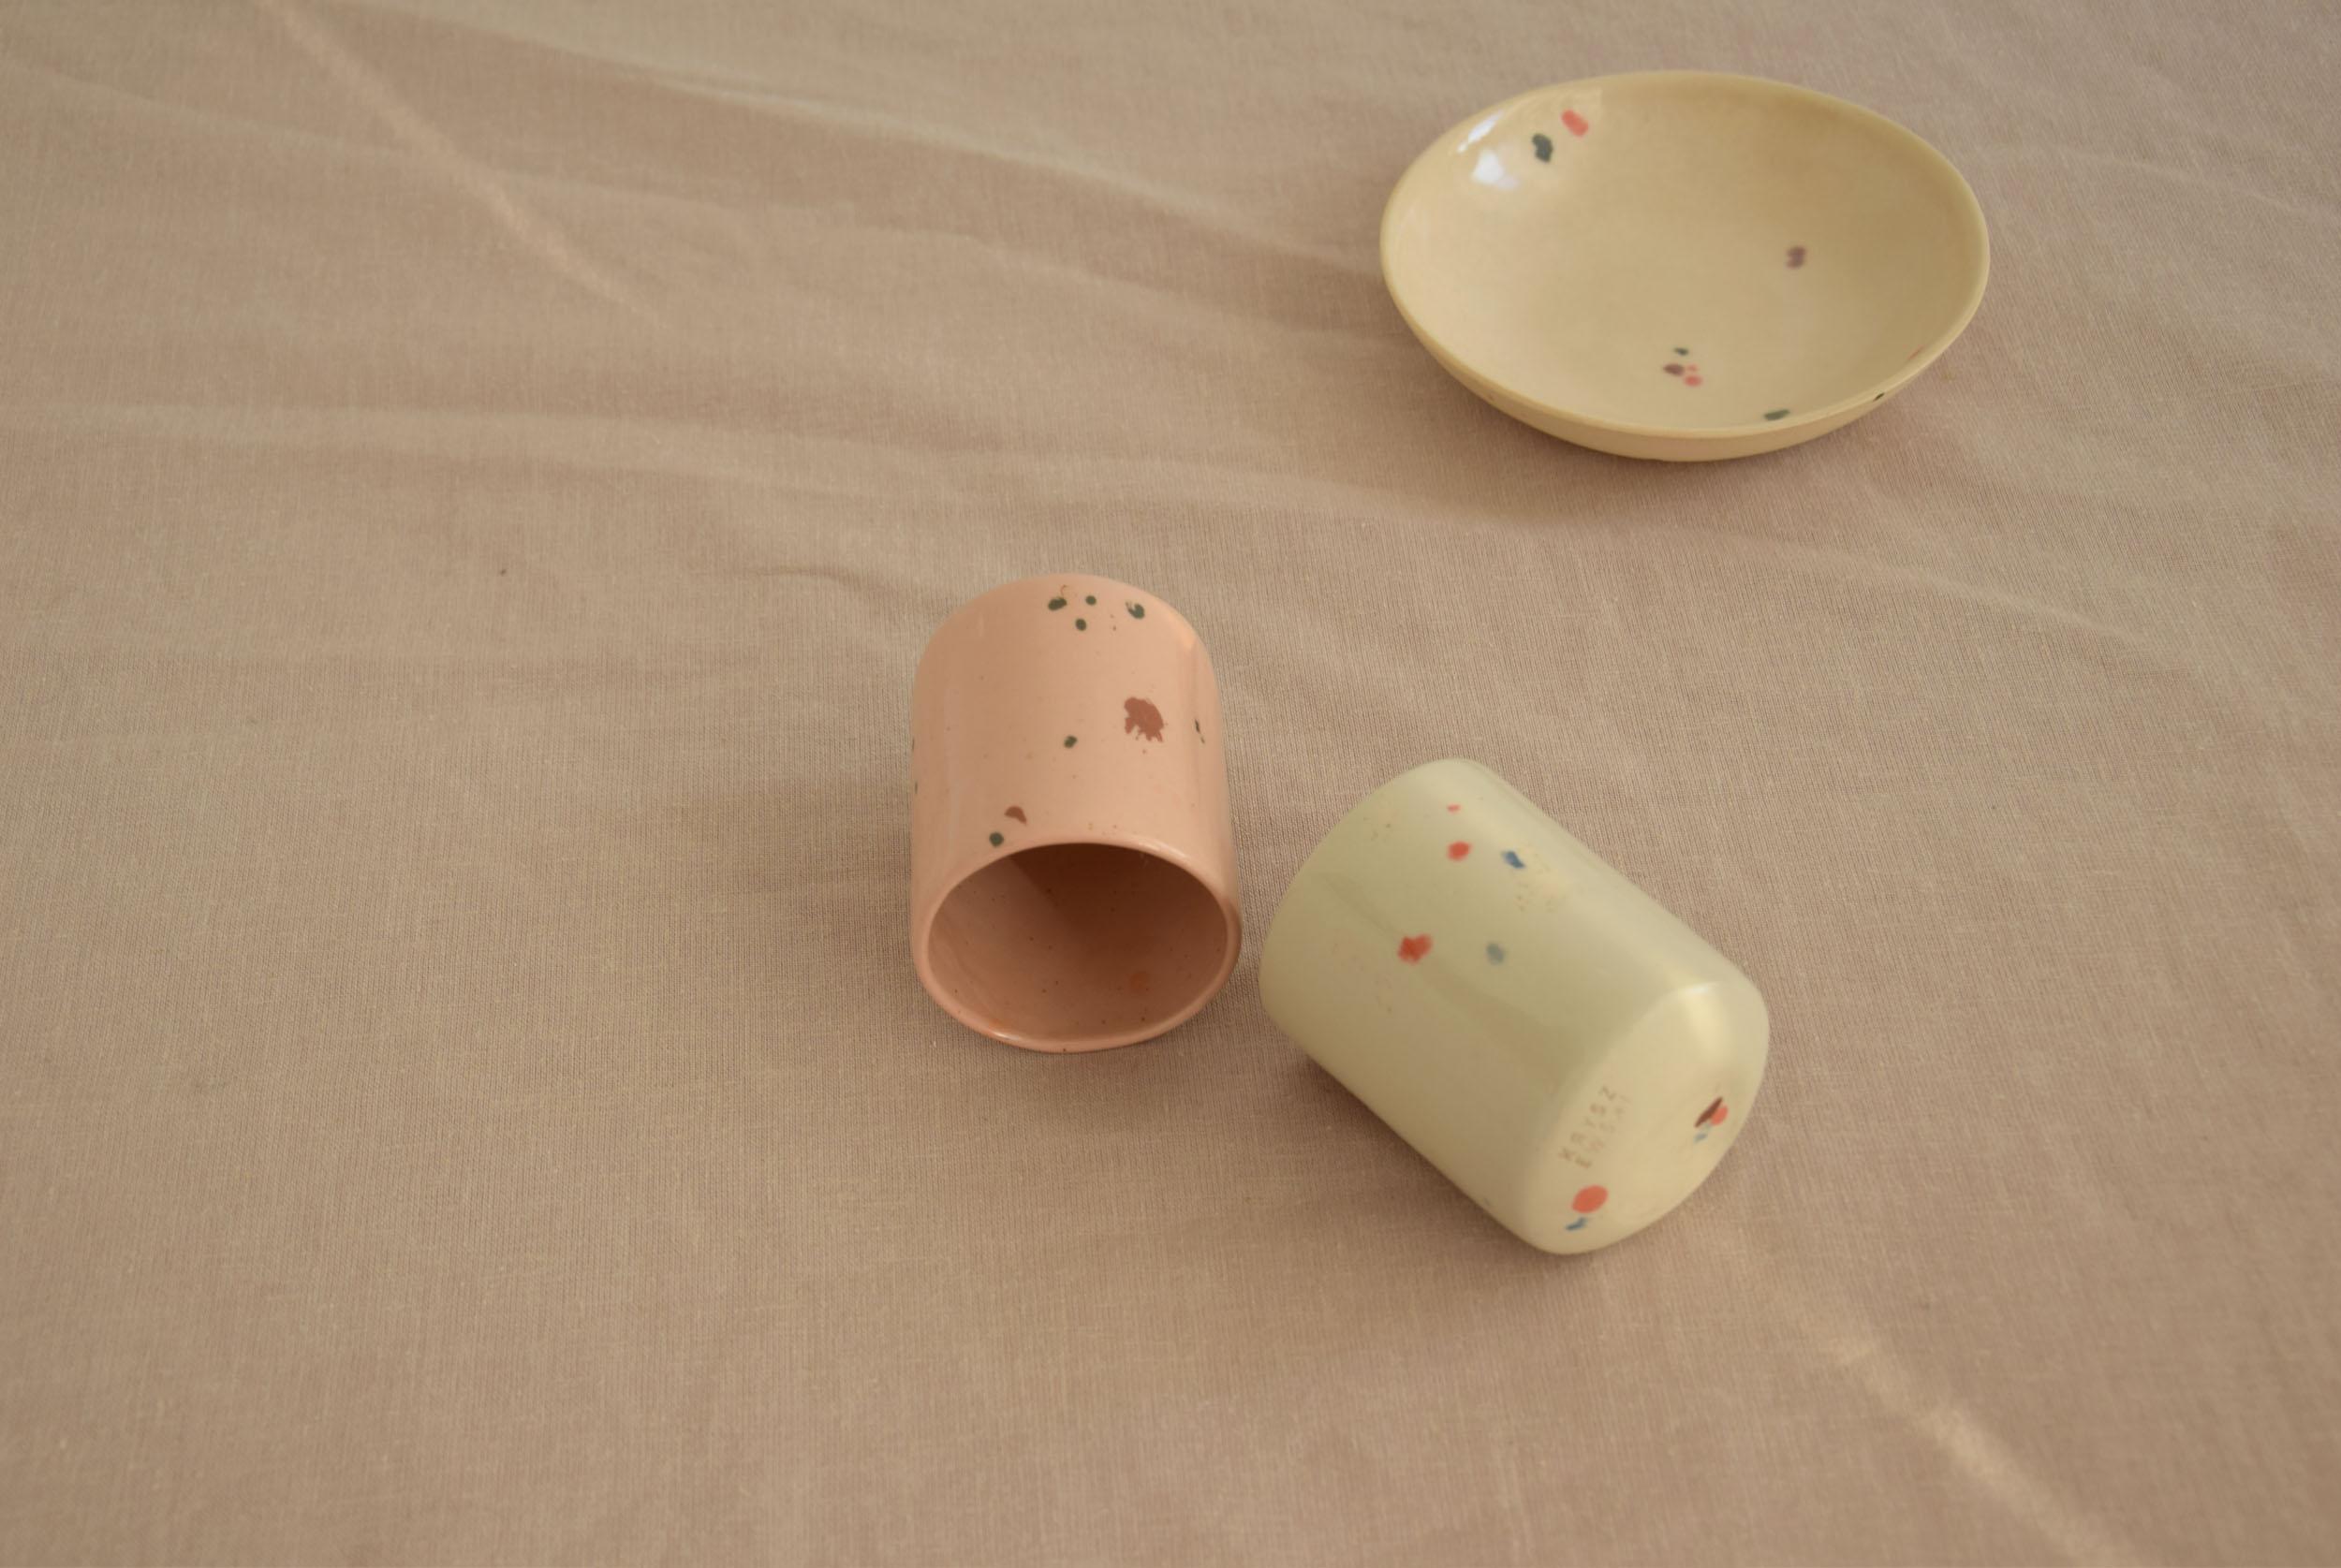 confetti1-studiokryszewski.jpg